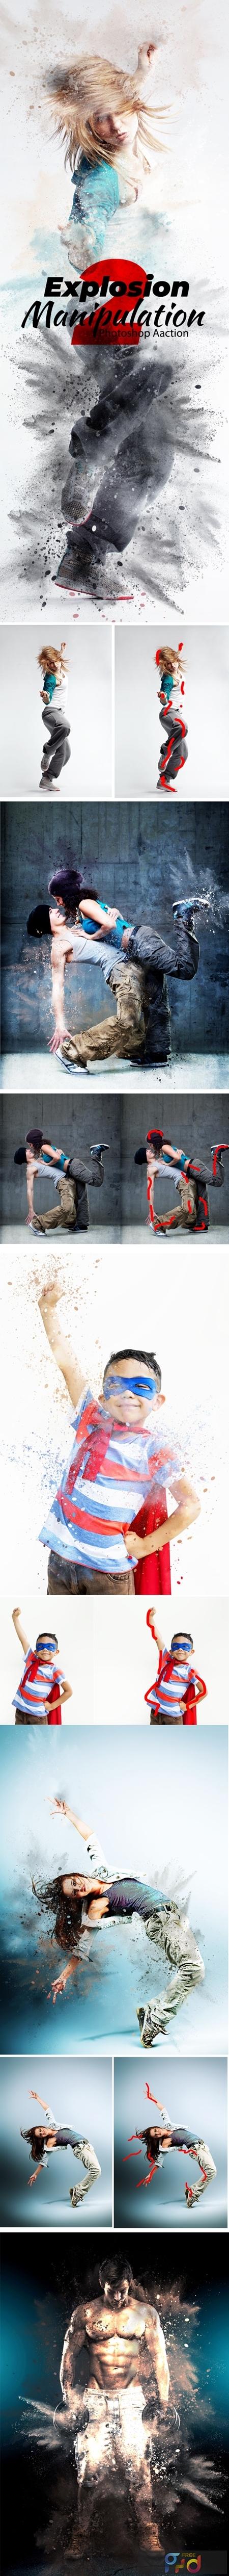 Explosion Photoshop Action 24374682 1